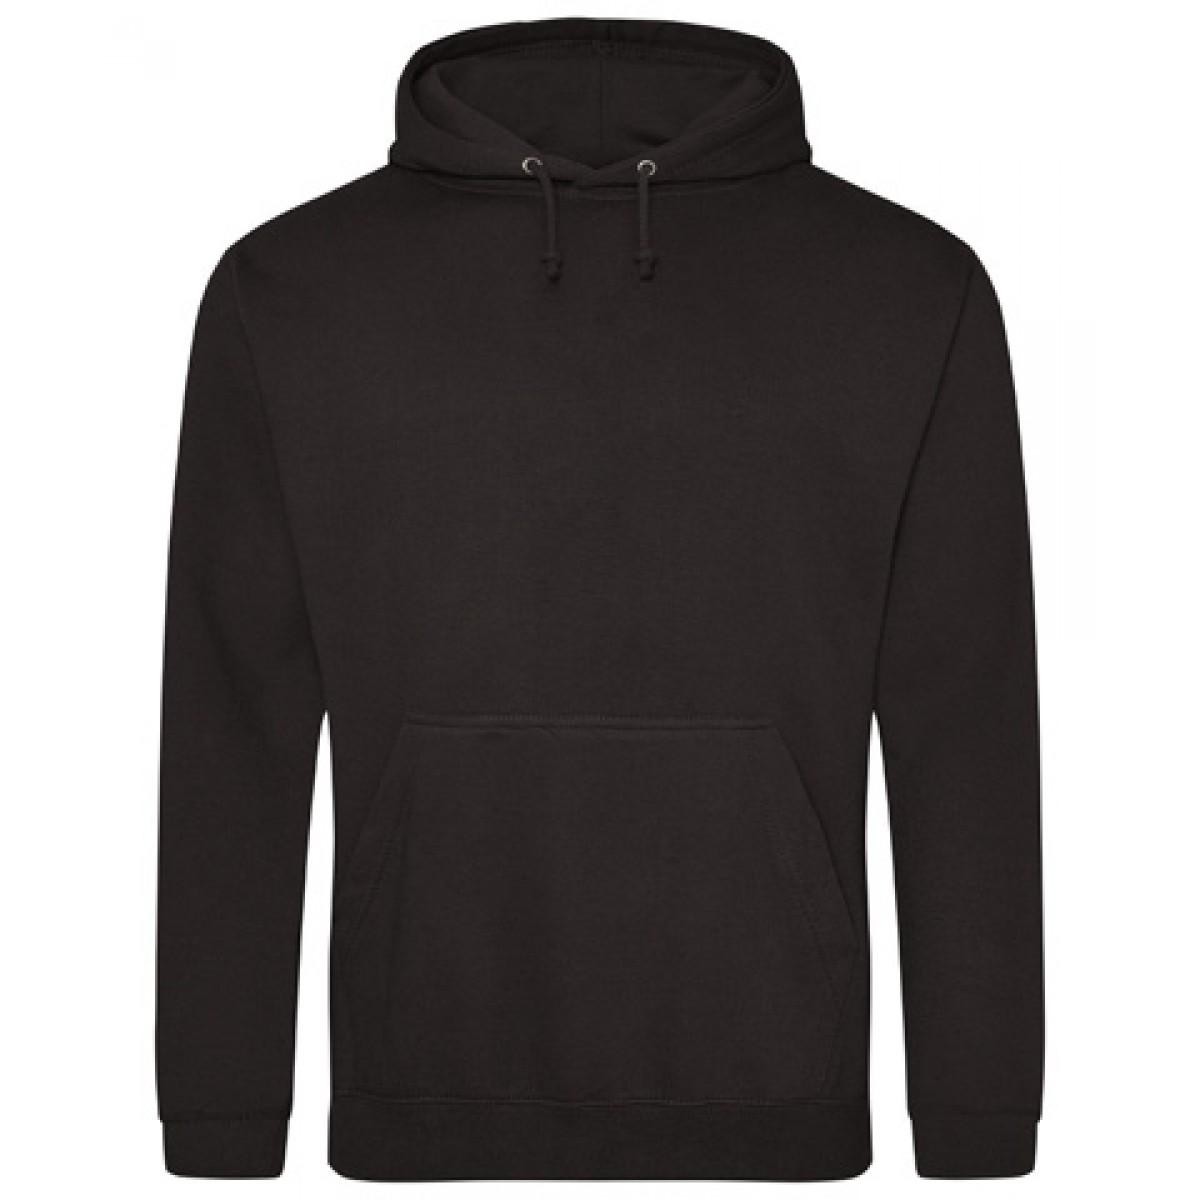 Hooded Sweatshirt 50/50 Heavy Blend-Black-YL